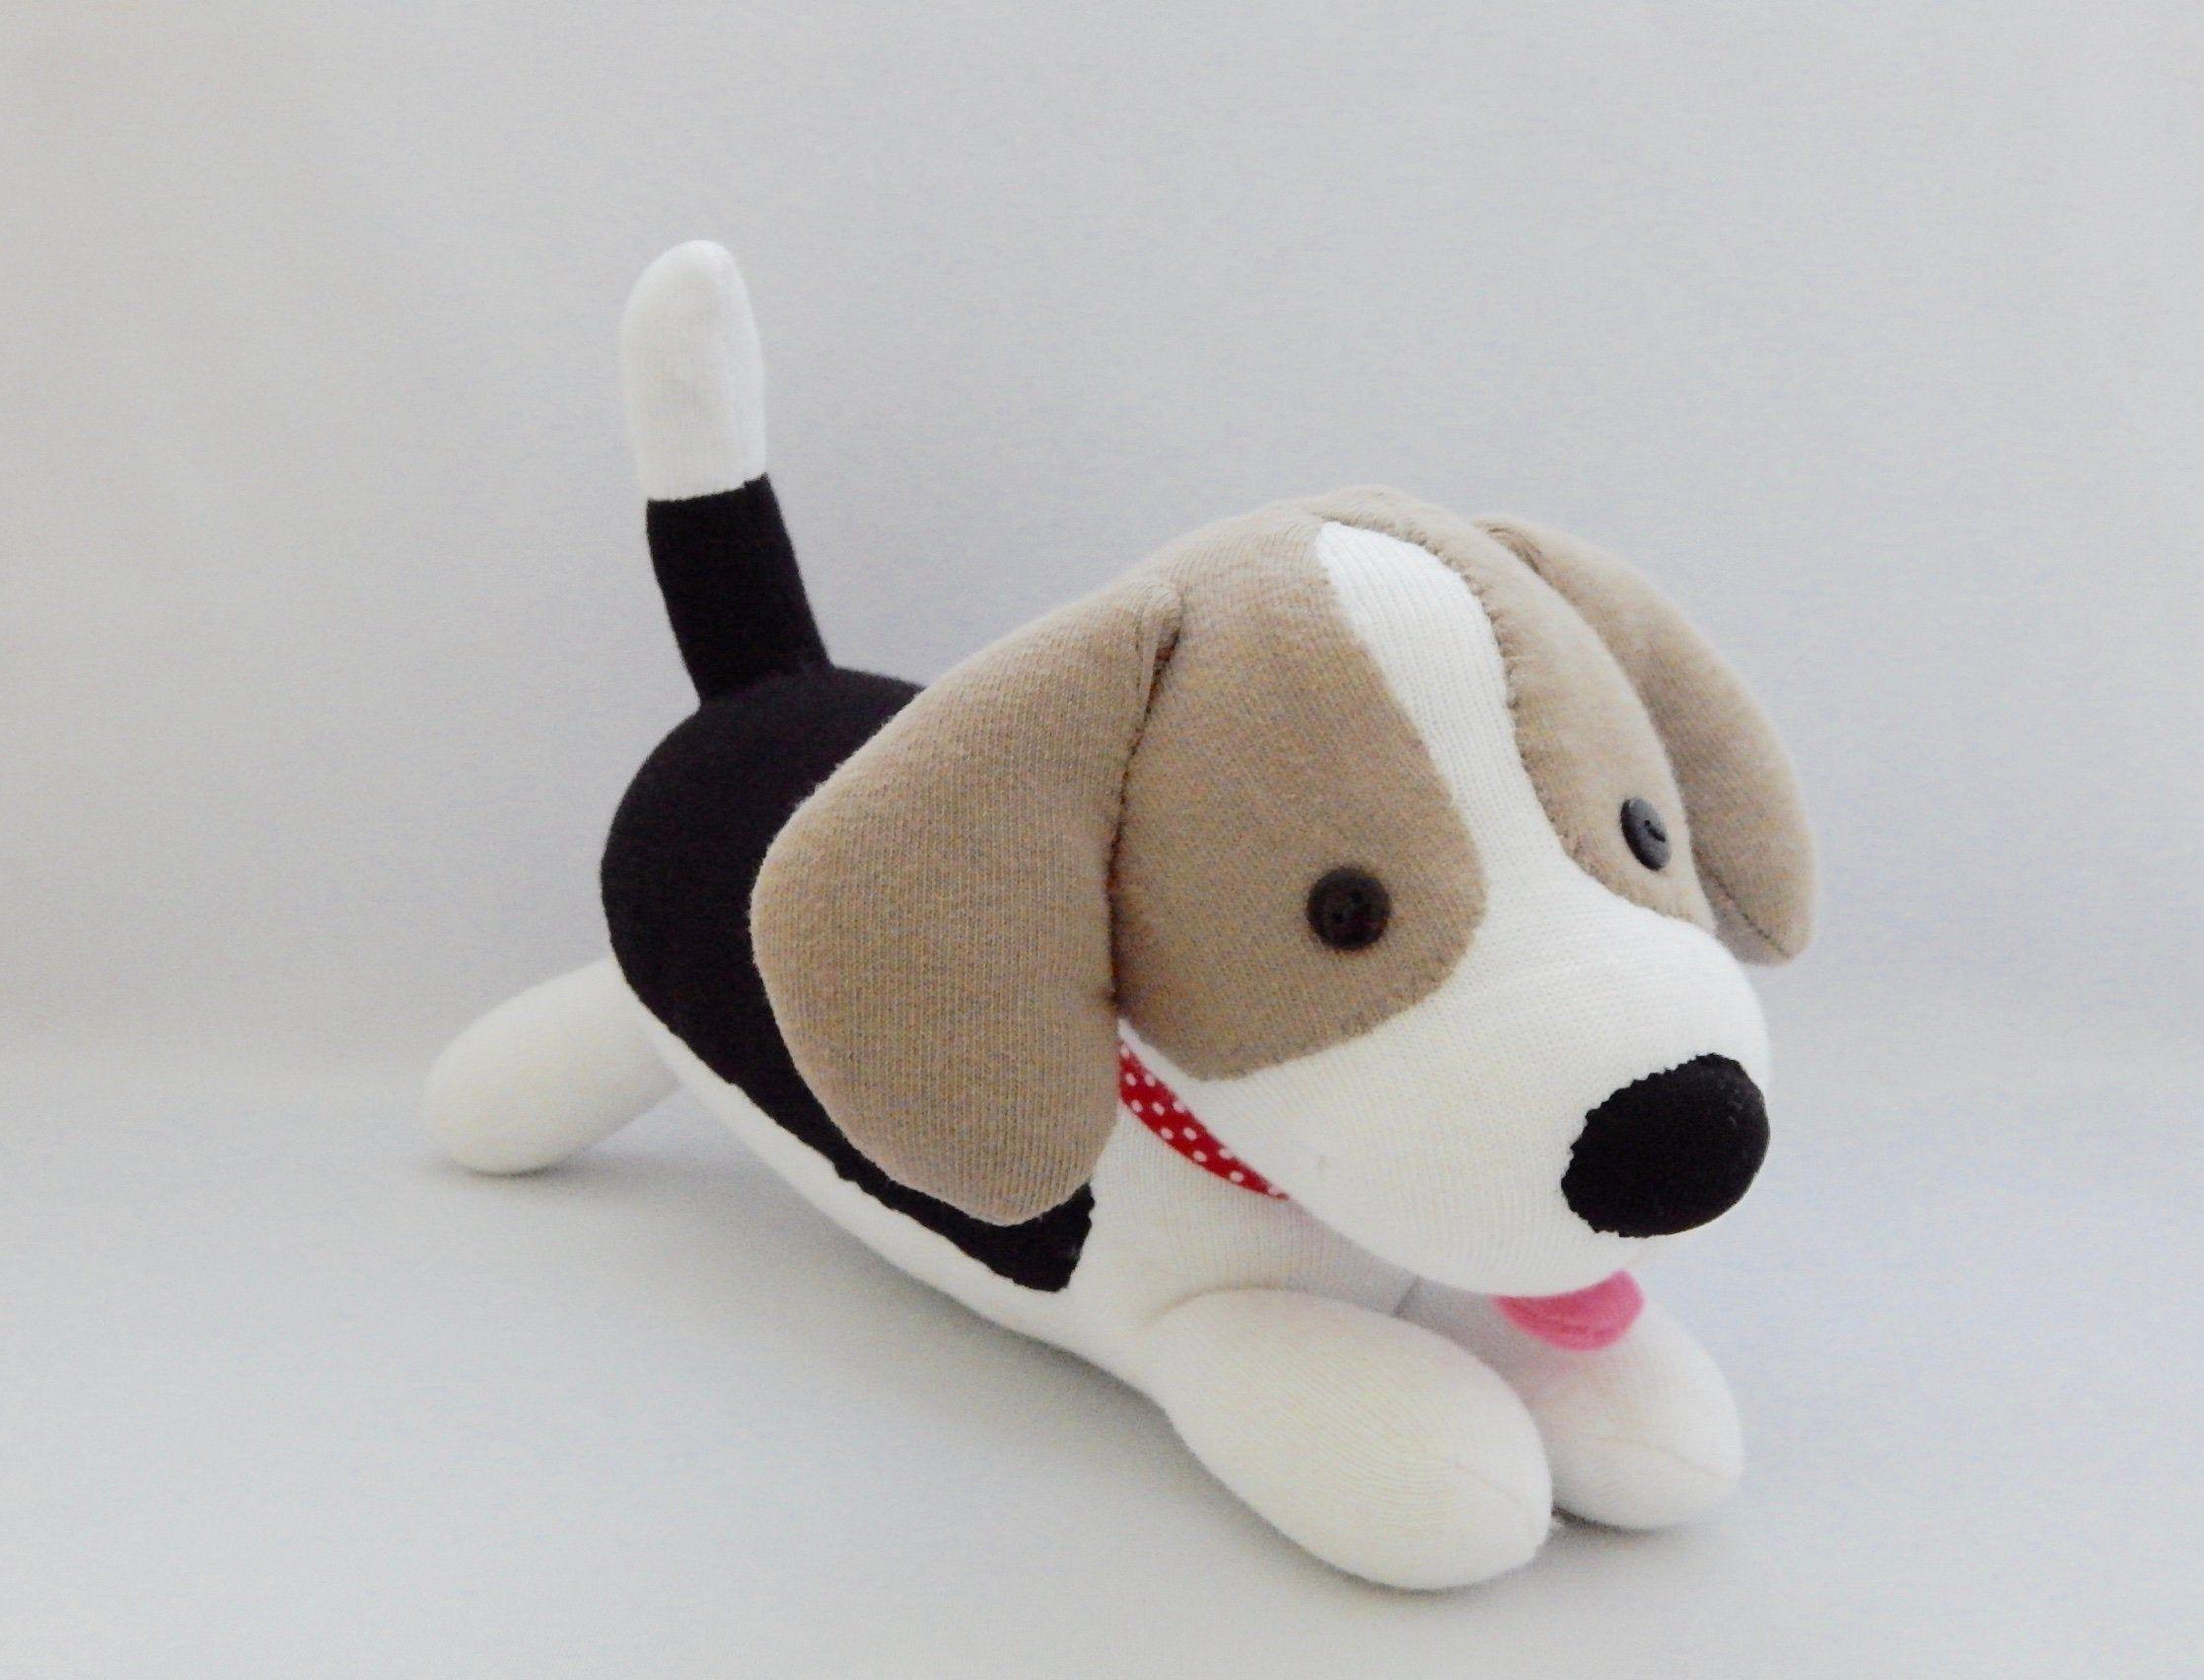 Beagle Puppy Plush Toy Dog Stuffed Animal Stuffed Doll Etsy Puppy Plush Toys Beagle Puppy Dog Stuffed Animal [ 1704 x 2235 Pixel ]